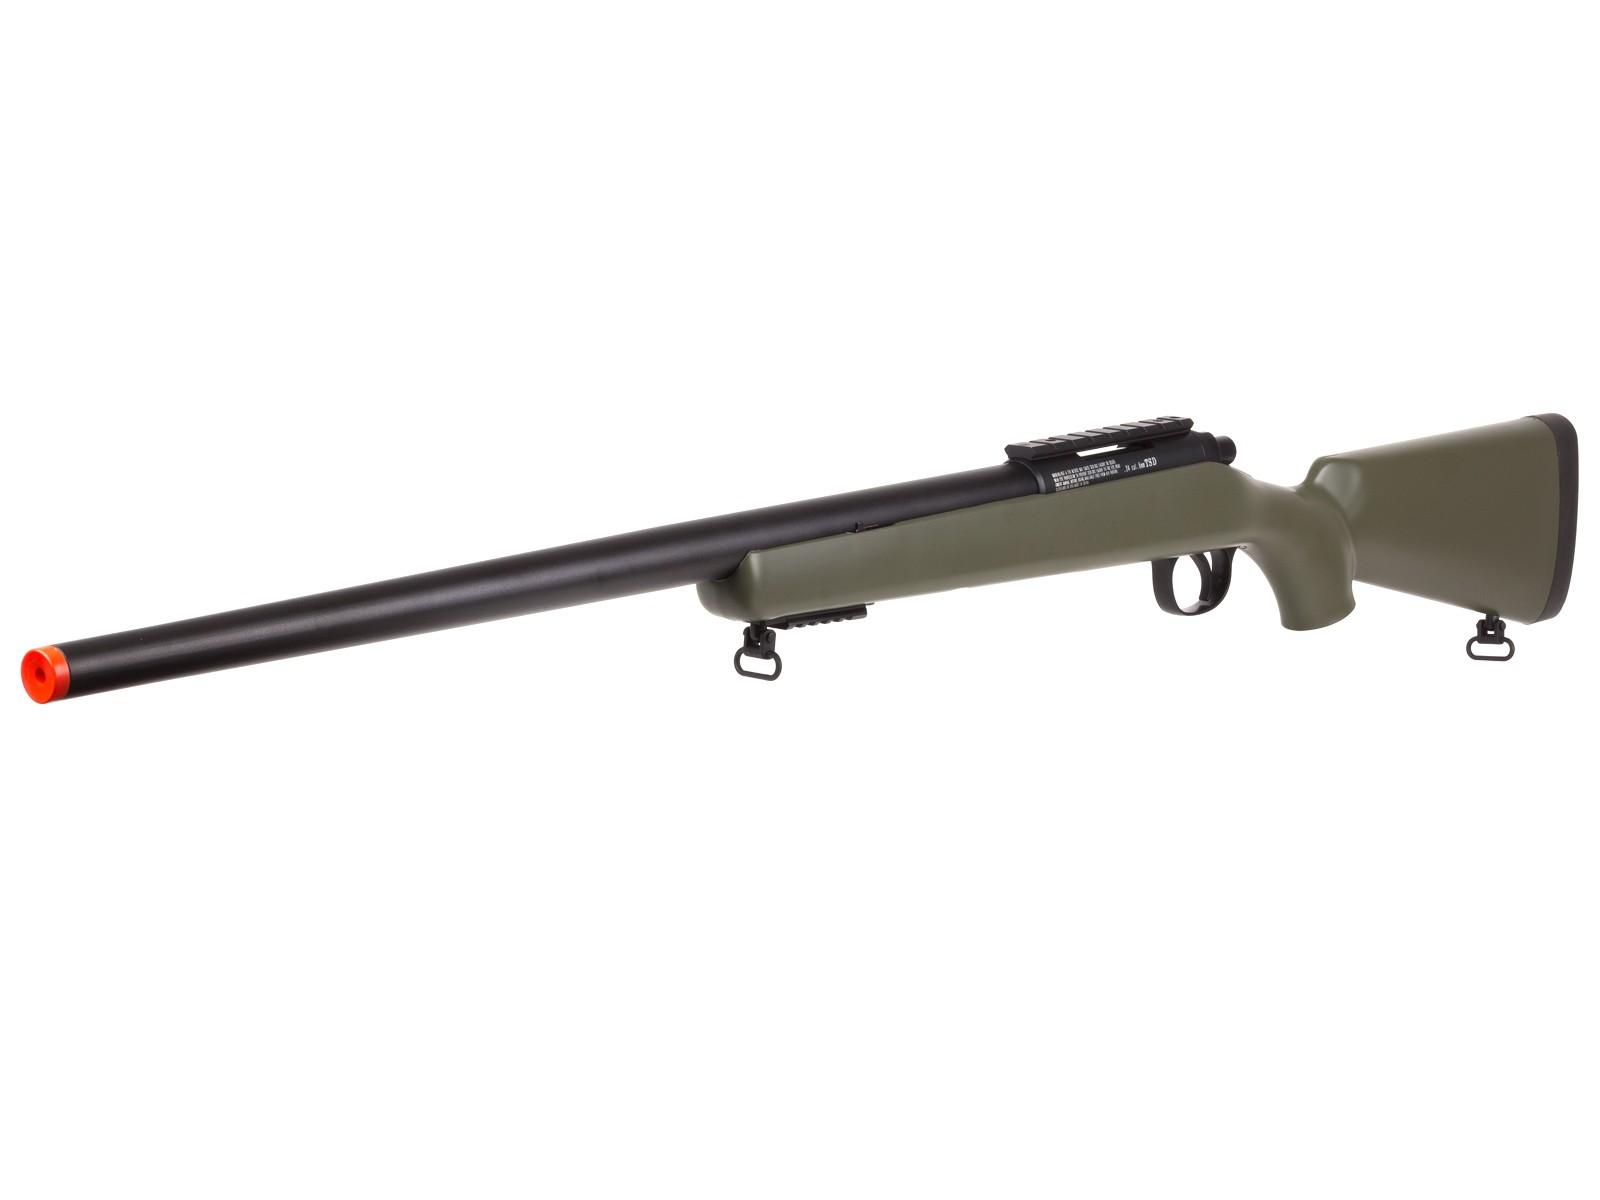 TSD_Tactical_Series_SD700__OD_Green_6mm